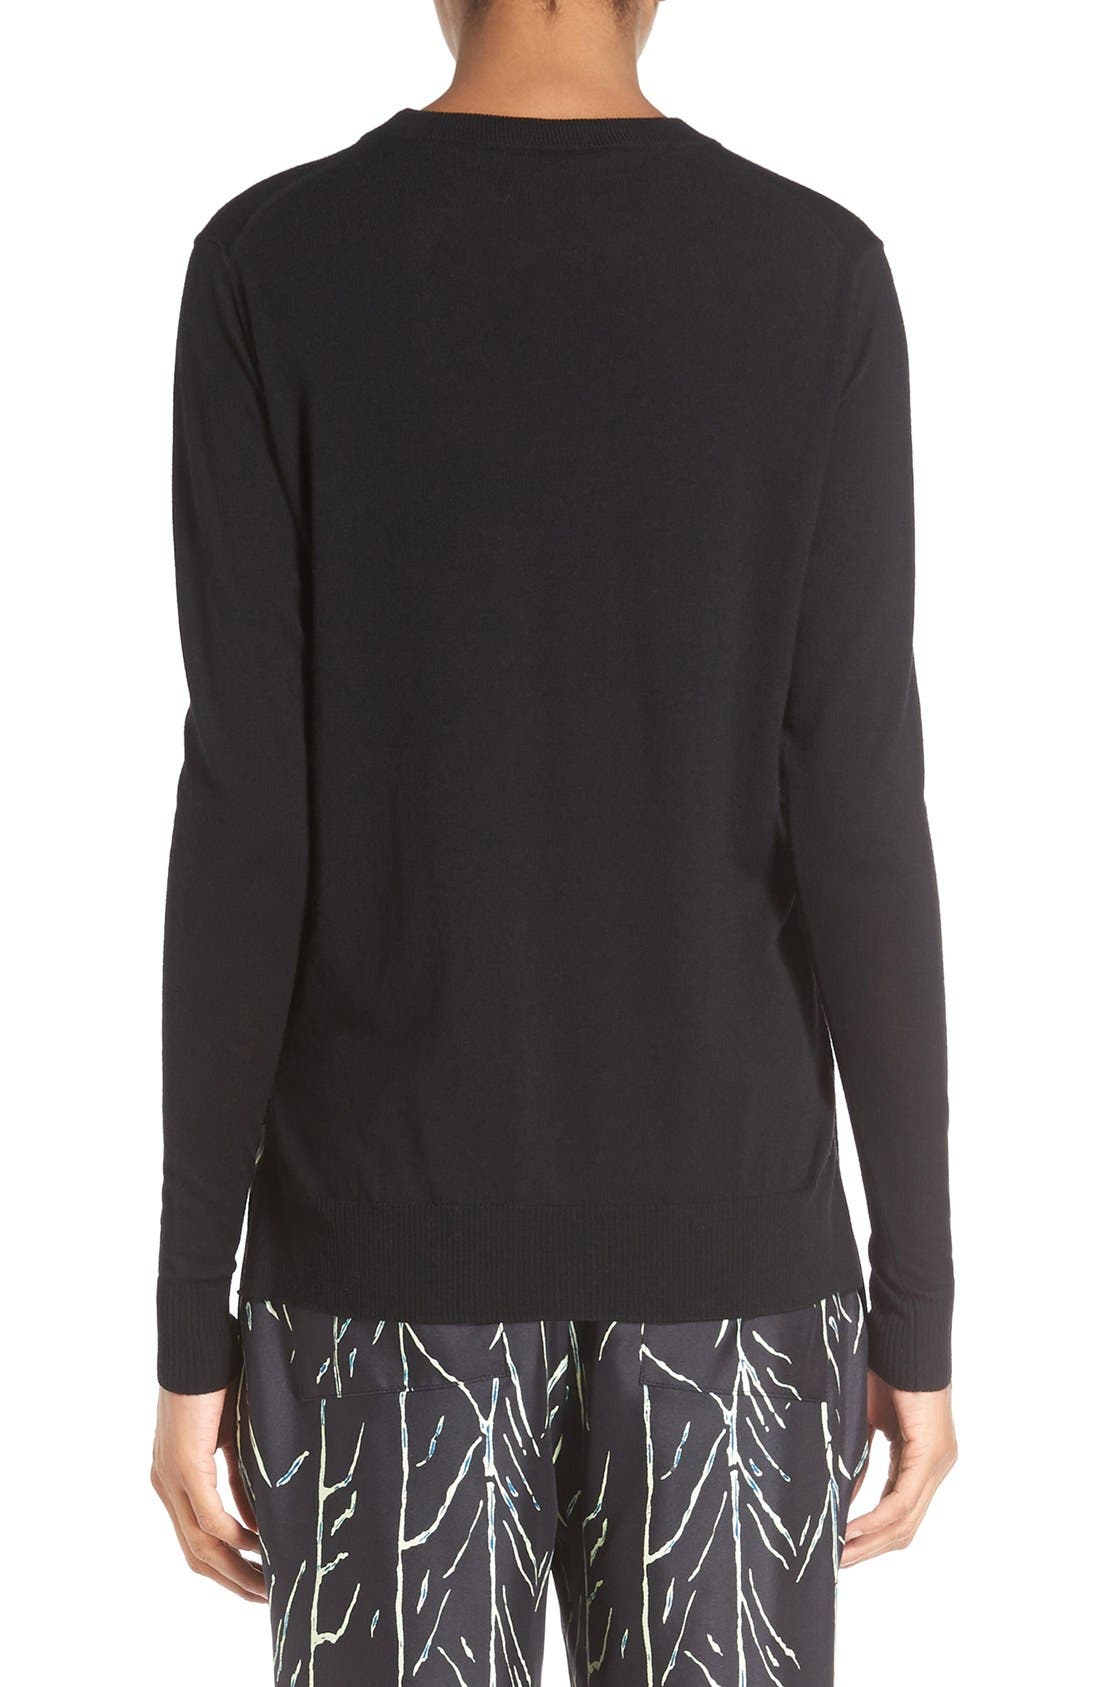 Superfine Merino Wool Sweater,                             Alternate thumbnail 11, color,                             001